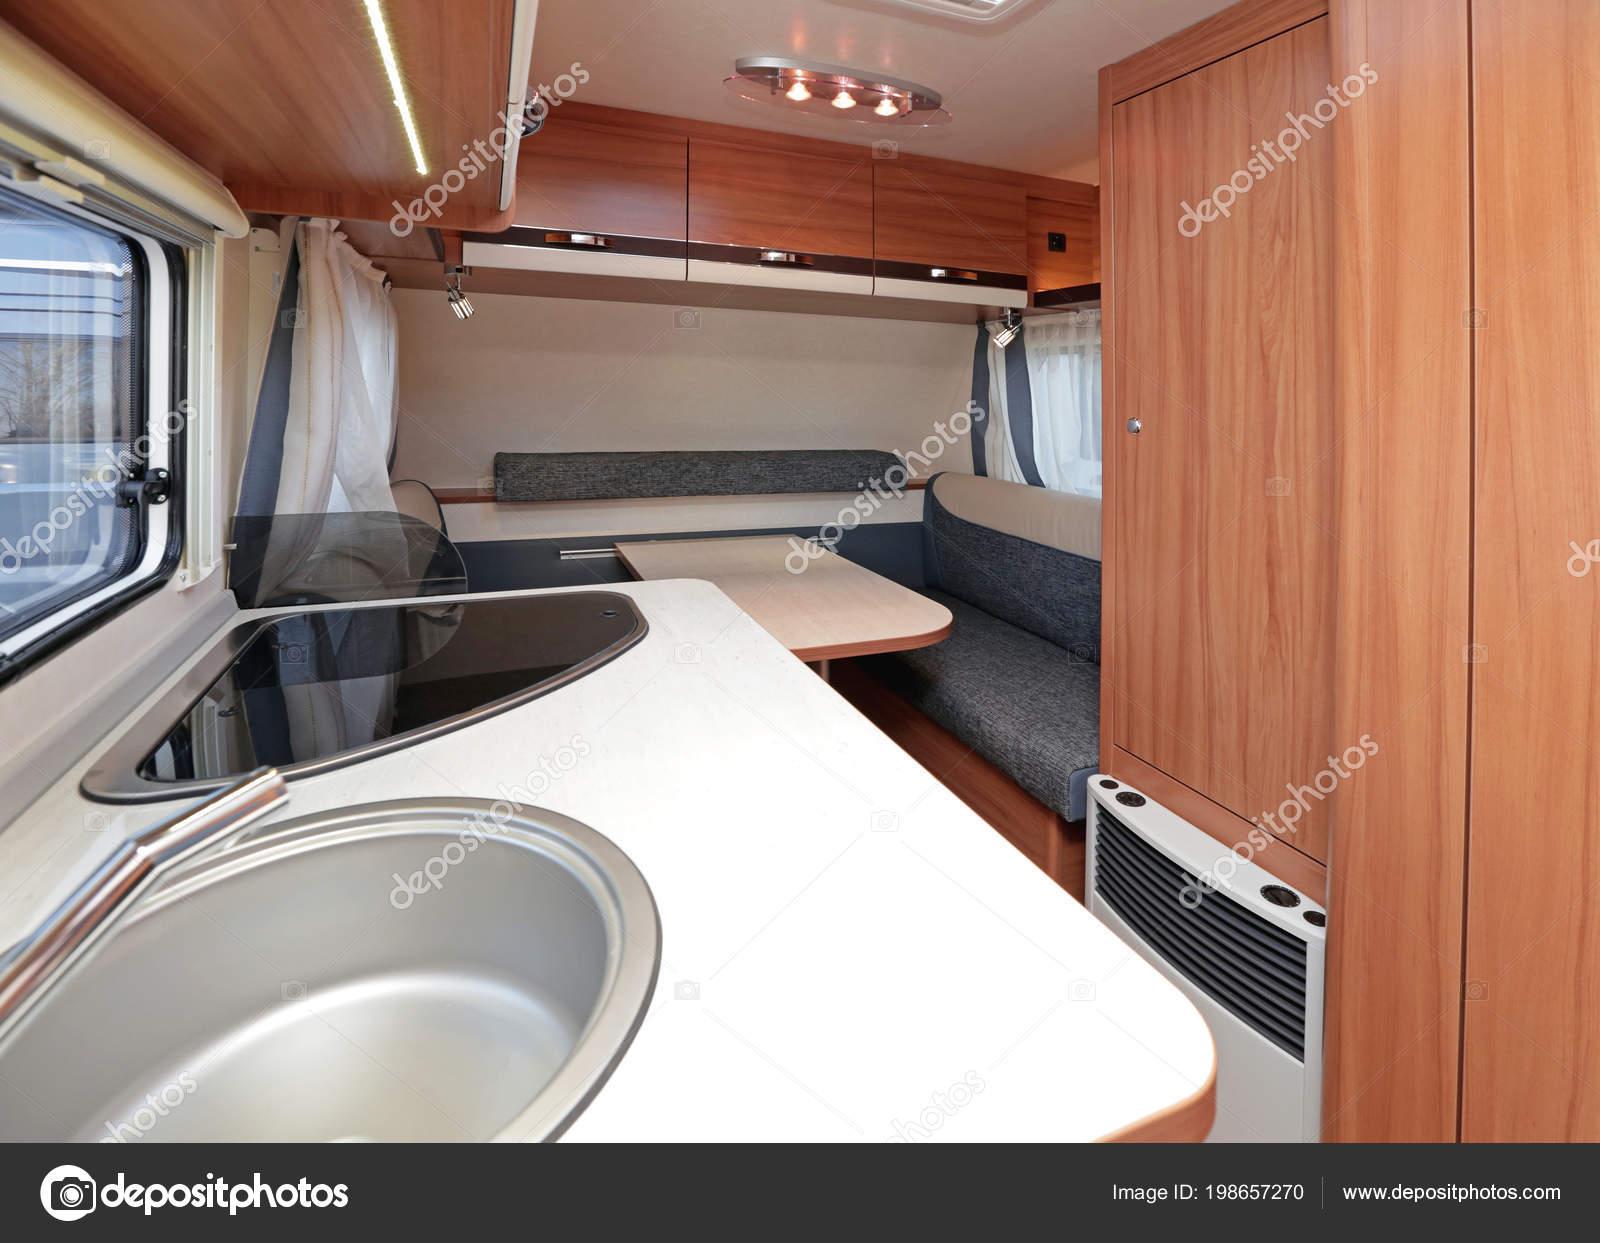 https://st4.depositphotos.com/1005951/19865/i/1600/depositphotos_198657270-stock-photo-kitchen-counter-dining-tablein-camping.jpg